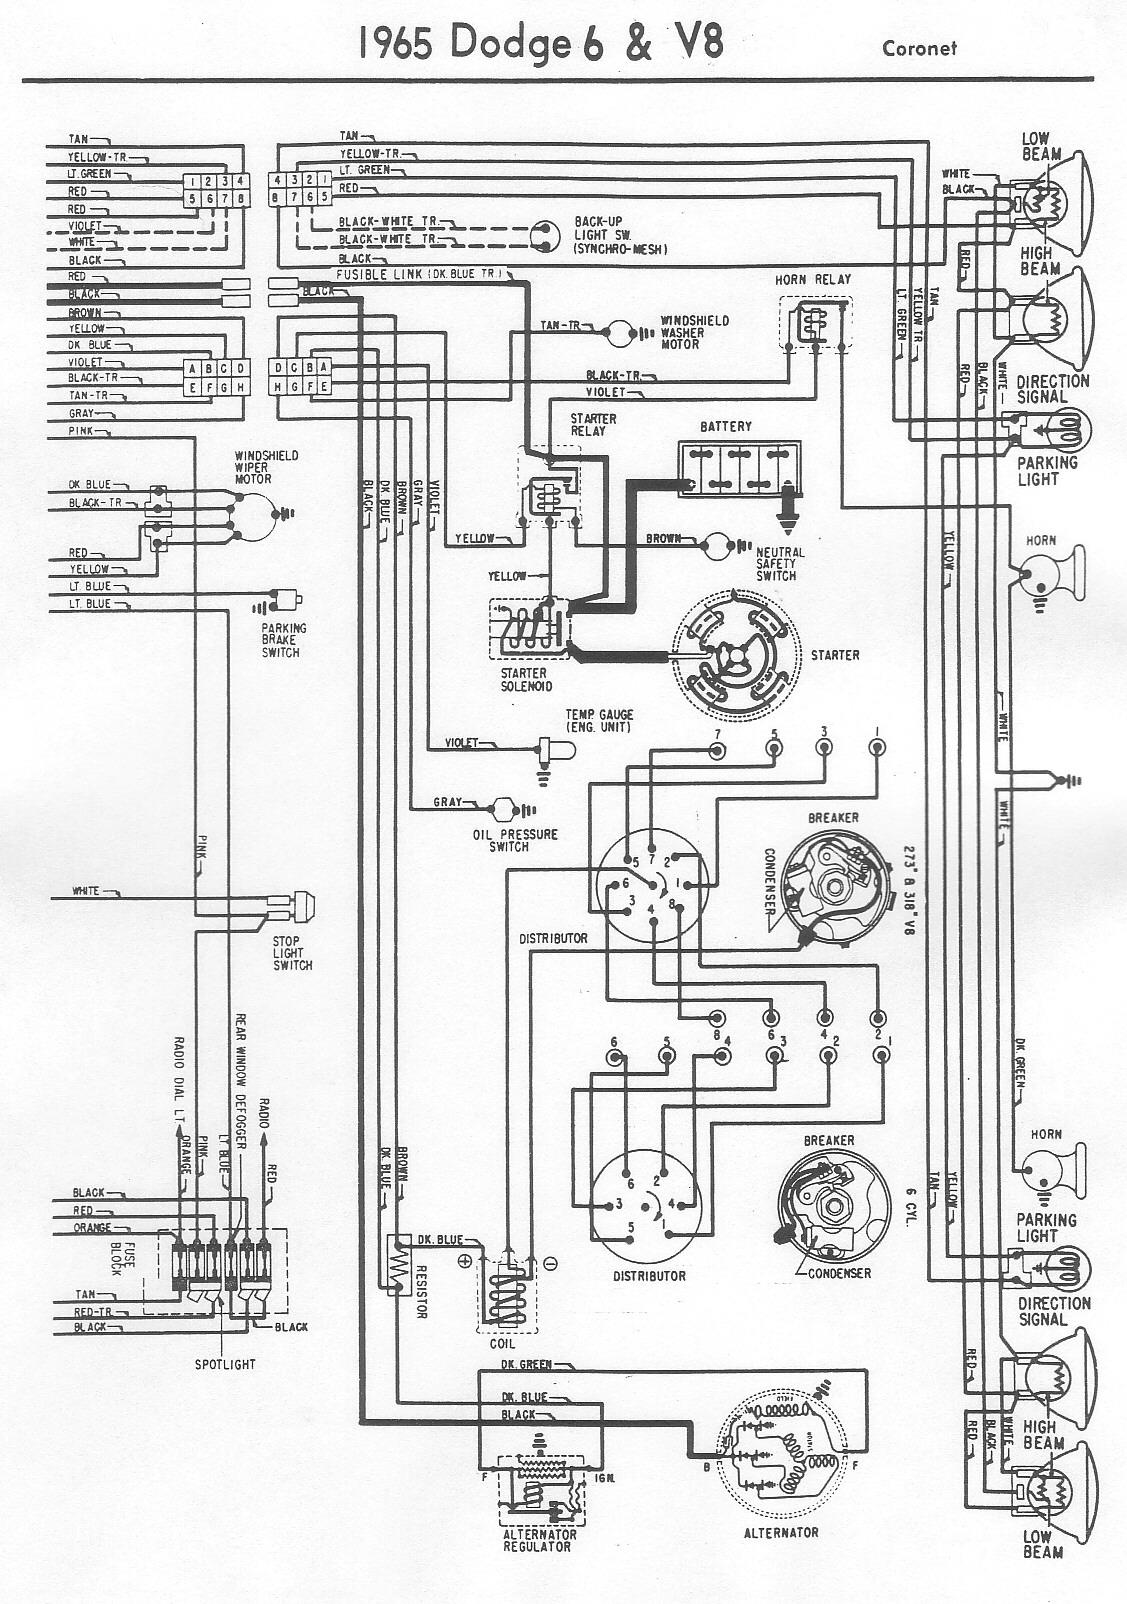 ZW_1887] Chrysler 440 Wiring Diagram Download DiagramXaem Nekout Mohammedshrine Librar Wiring 101